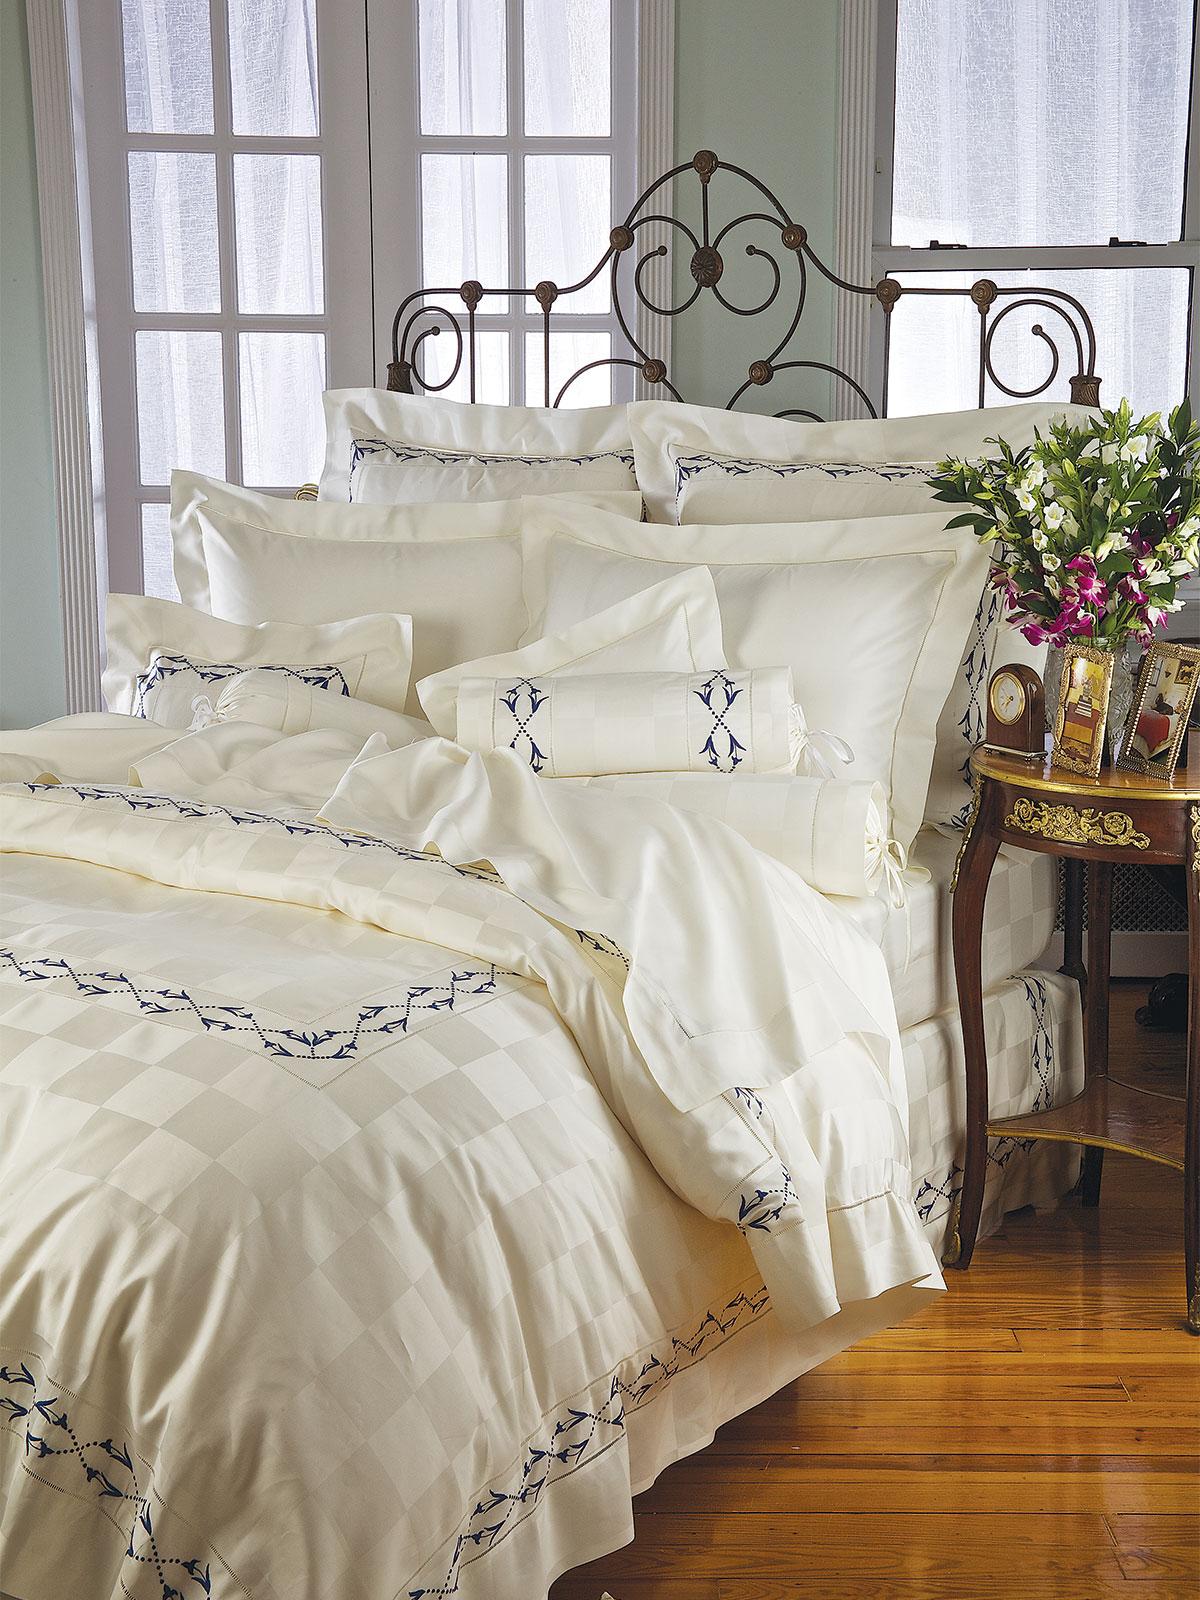 Hollandia Fine Bed Linens Luxury Bedding Italian Bed